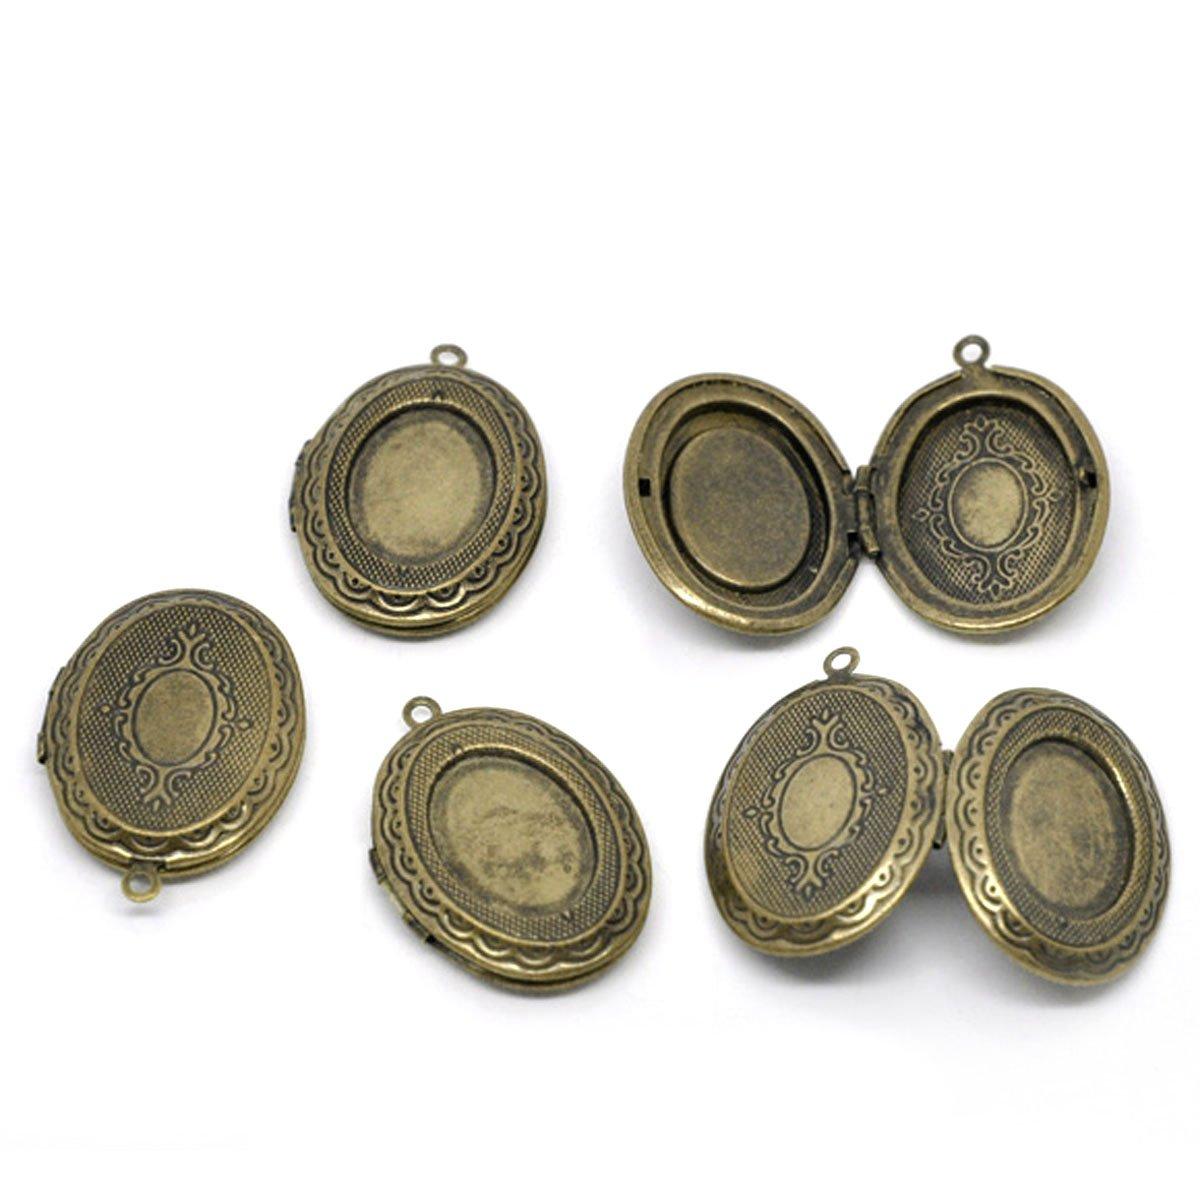 Hot Sale 5 Medallion Oval Pendants 34x24mm Bronze Color Photo holder